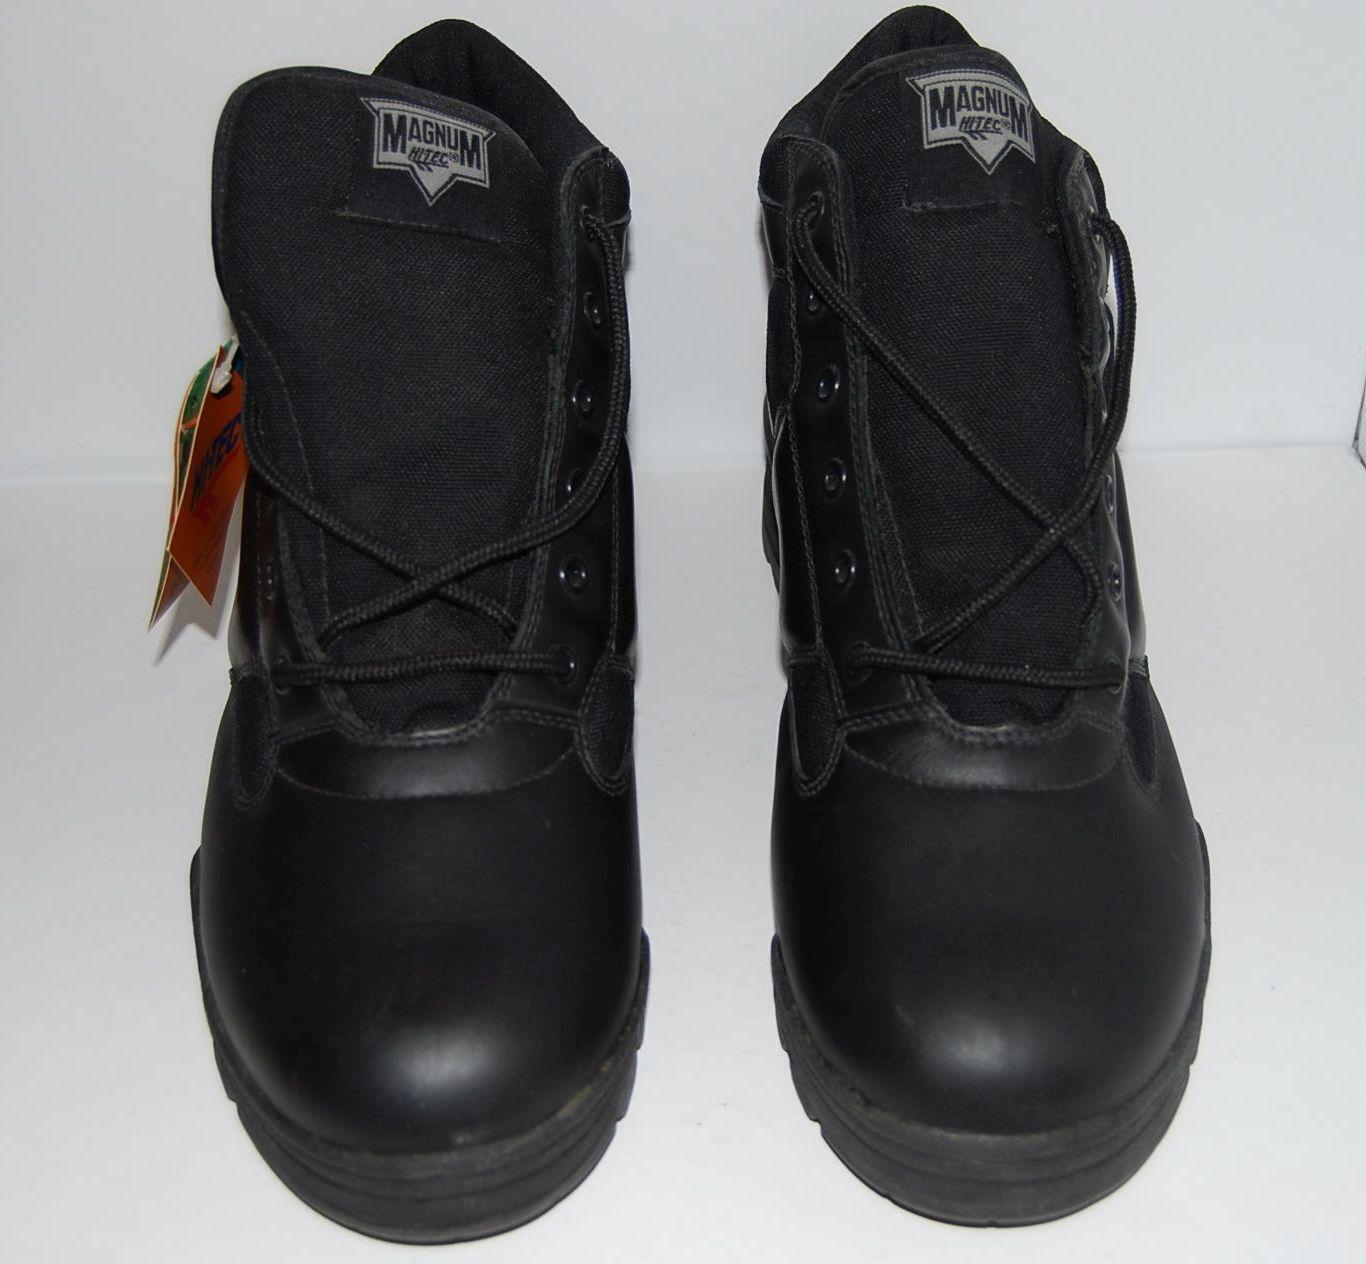 CHAUSSURE BOOTS HOMME MAGNUM HI-TEC SERIE MIDNITE size   47 black .